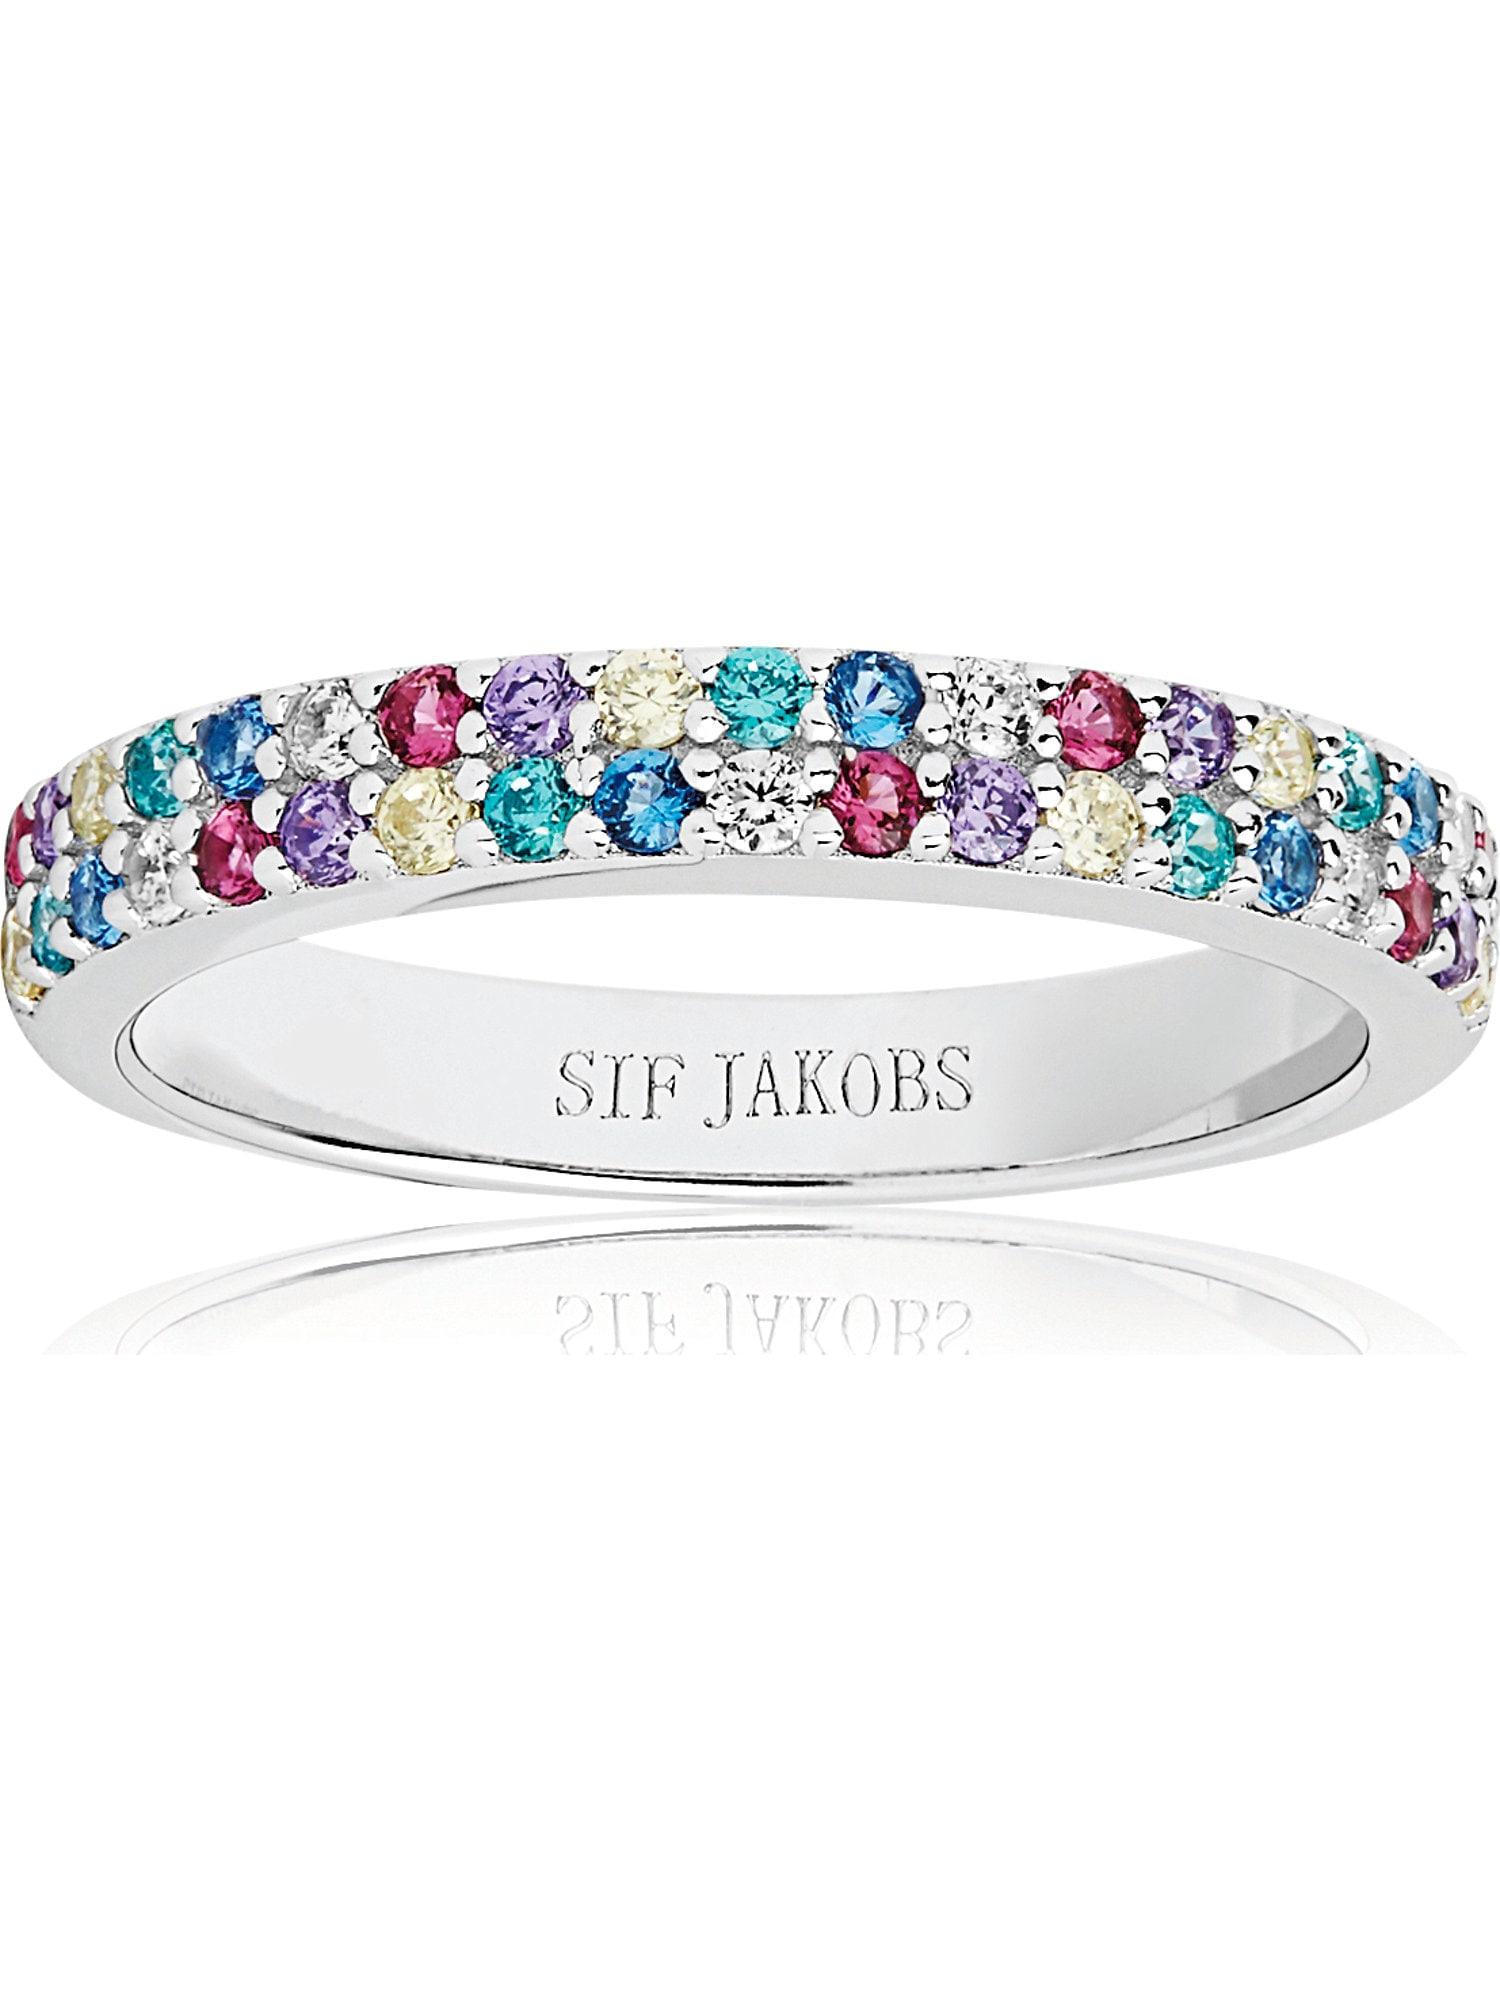 Damen Sif Jakobs Ring 'Corte Due' silber | 05710698060907